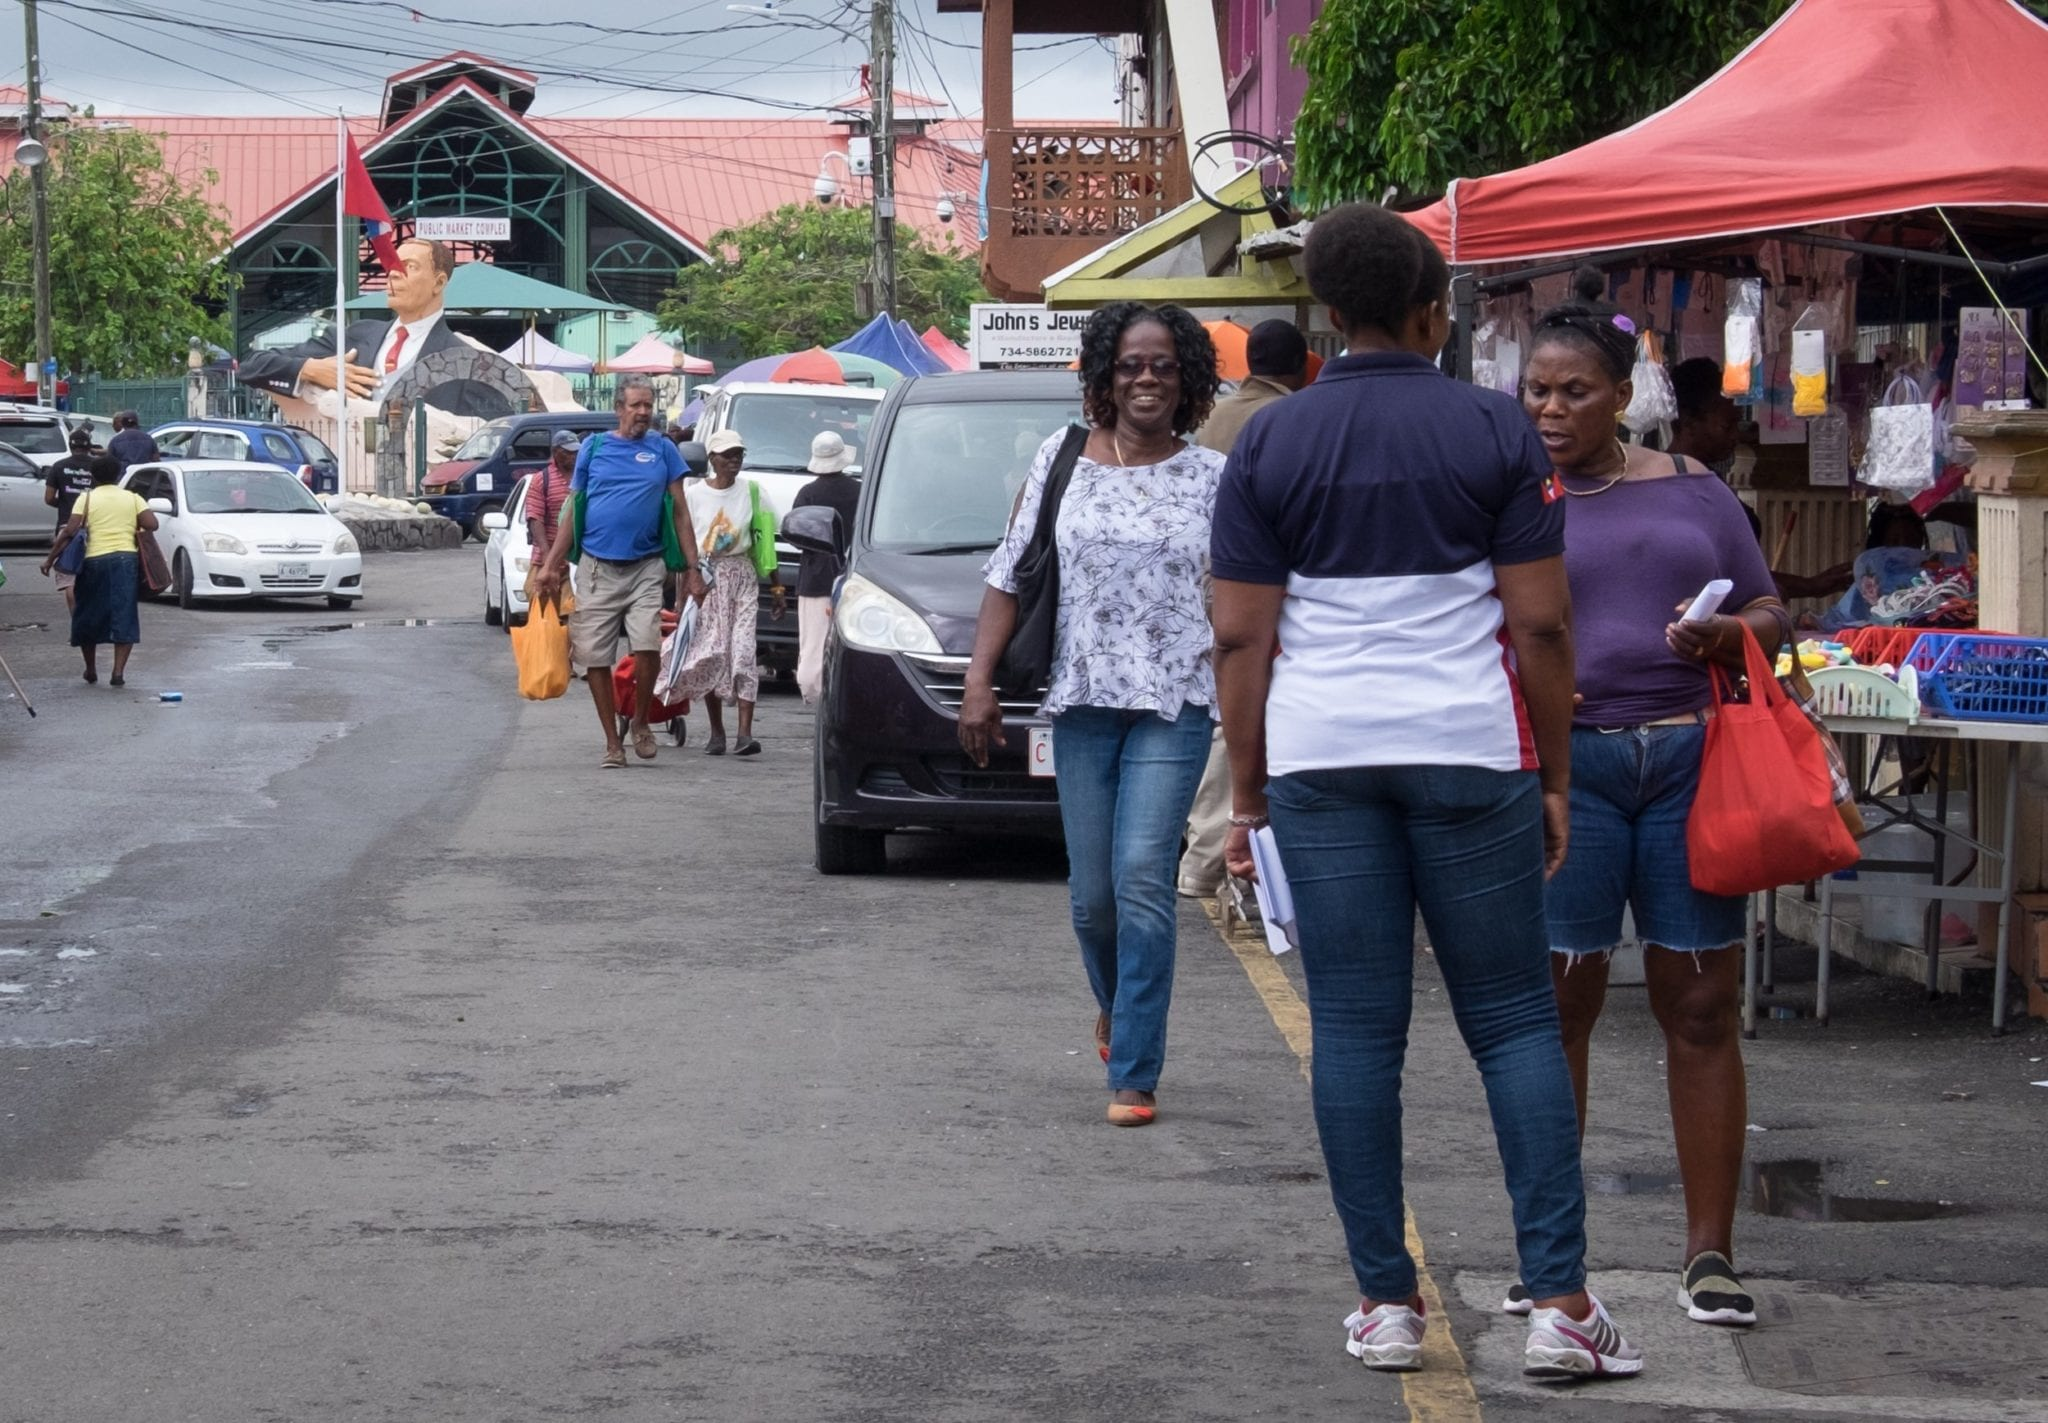 Two women green each other when walking down the street in St. John's Antigua.